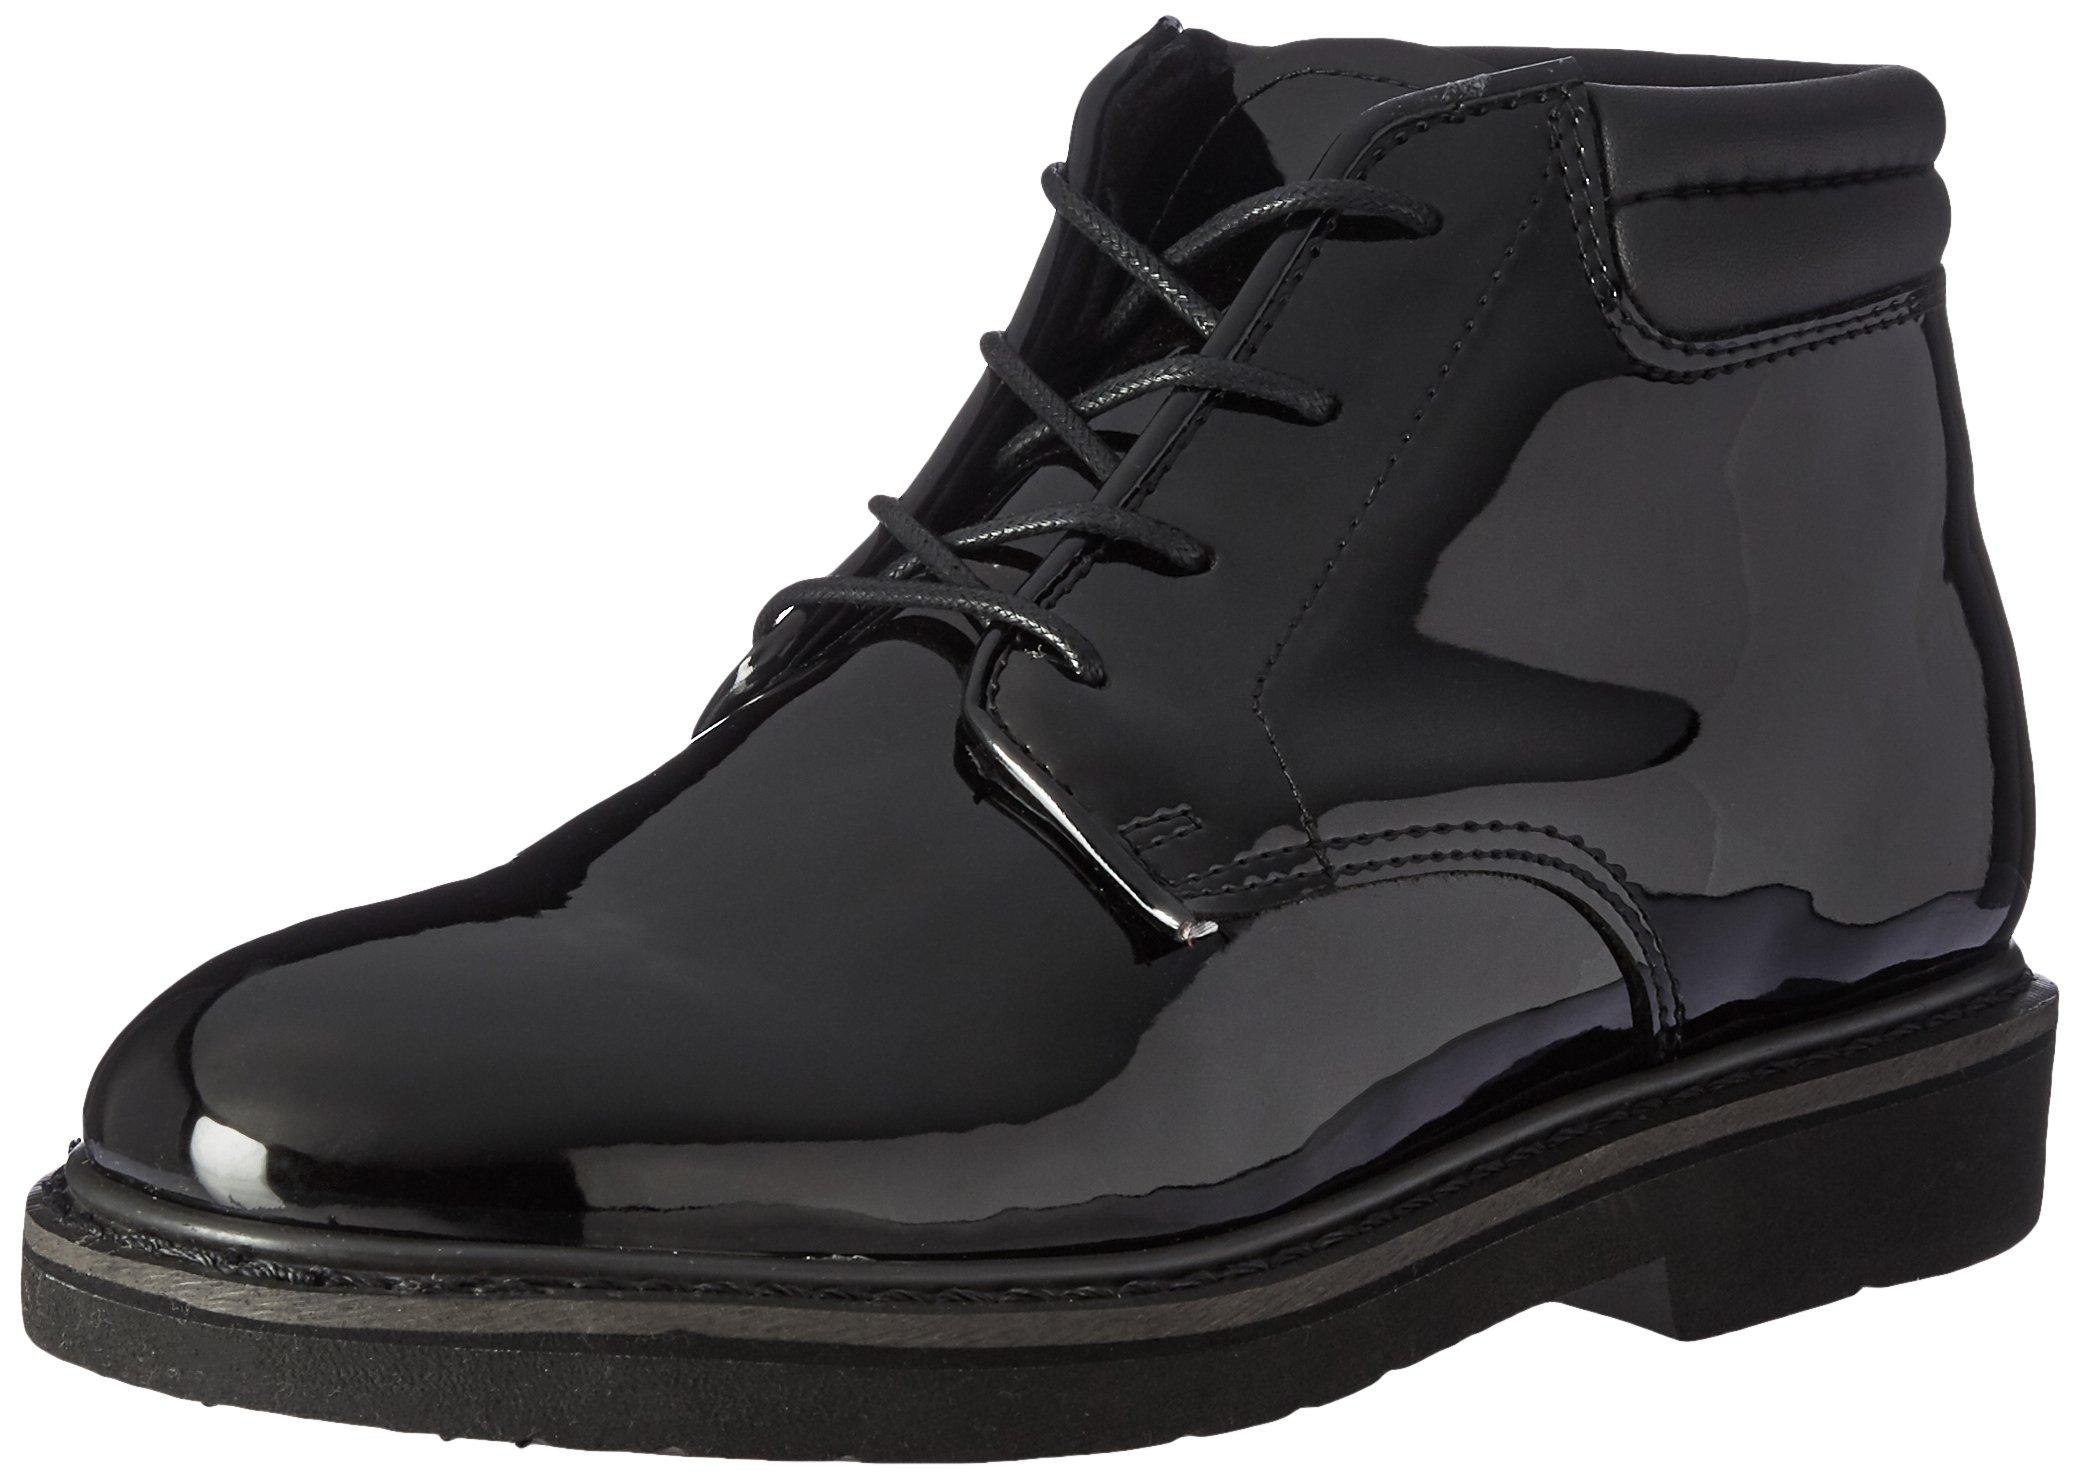 Rocky Men's 6 Inch Professional Dress 500-8 Work Boot,Black,10 XW US by Rocky (Image #1)